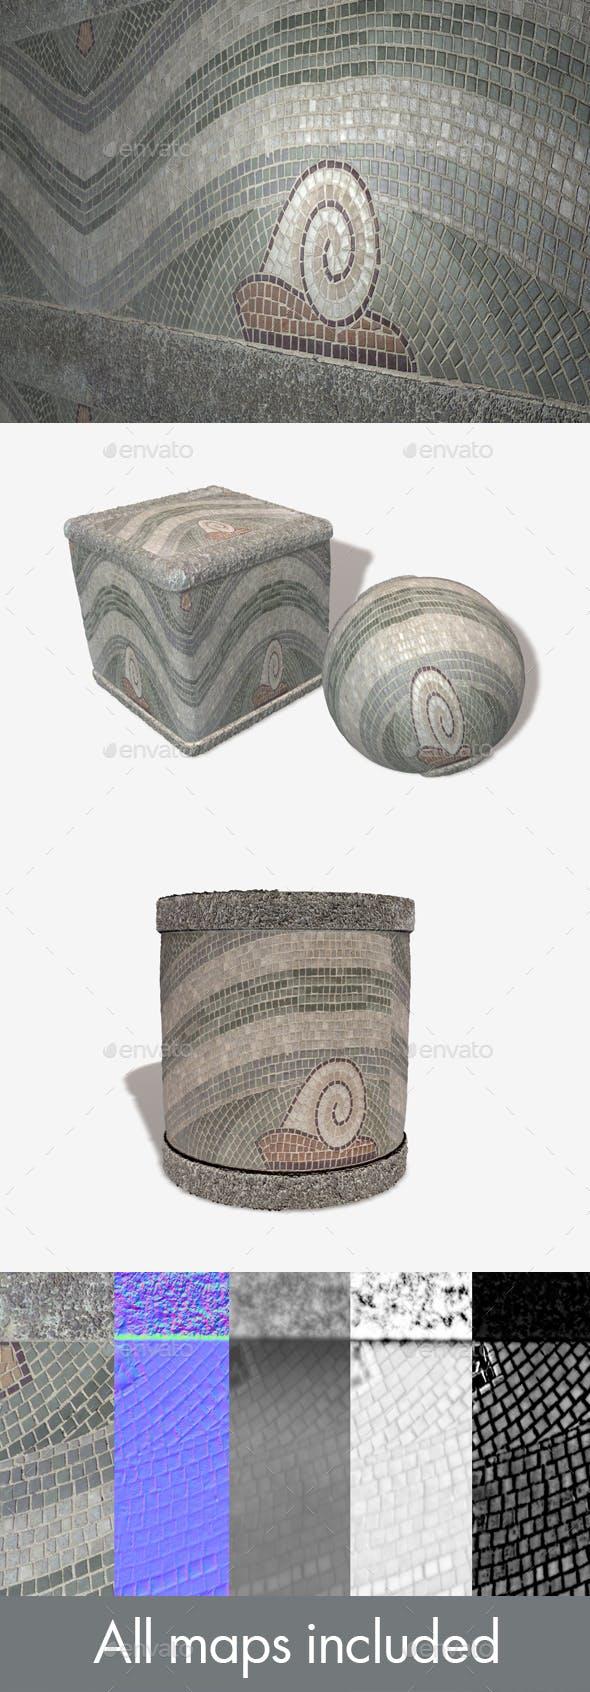 Seascape Mosaic Strip Seamless Texture - 3DOcean Item for Sale